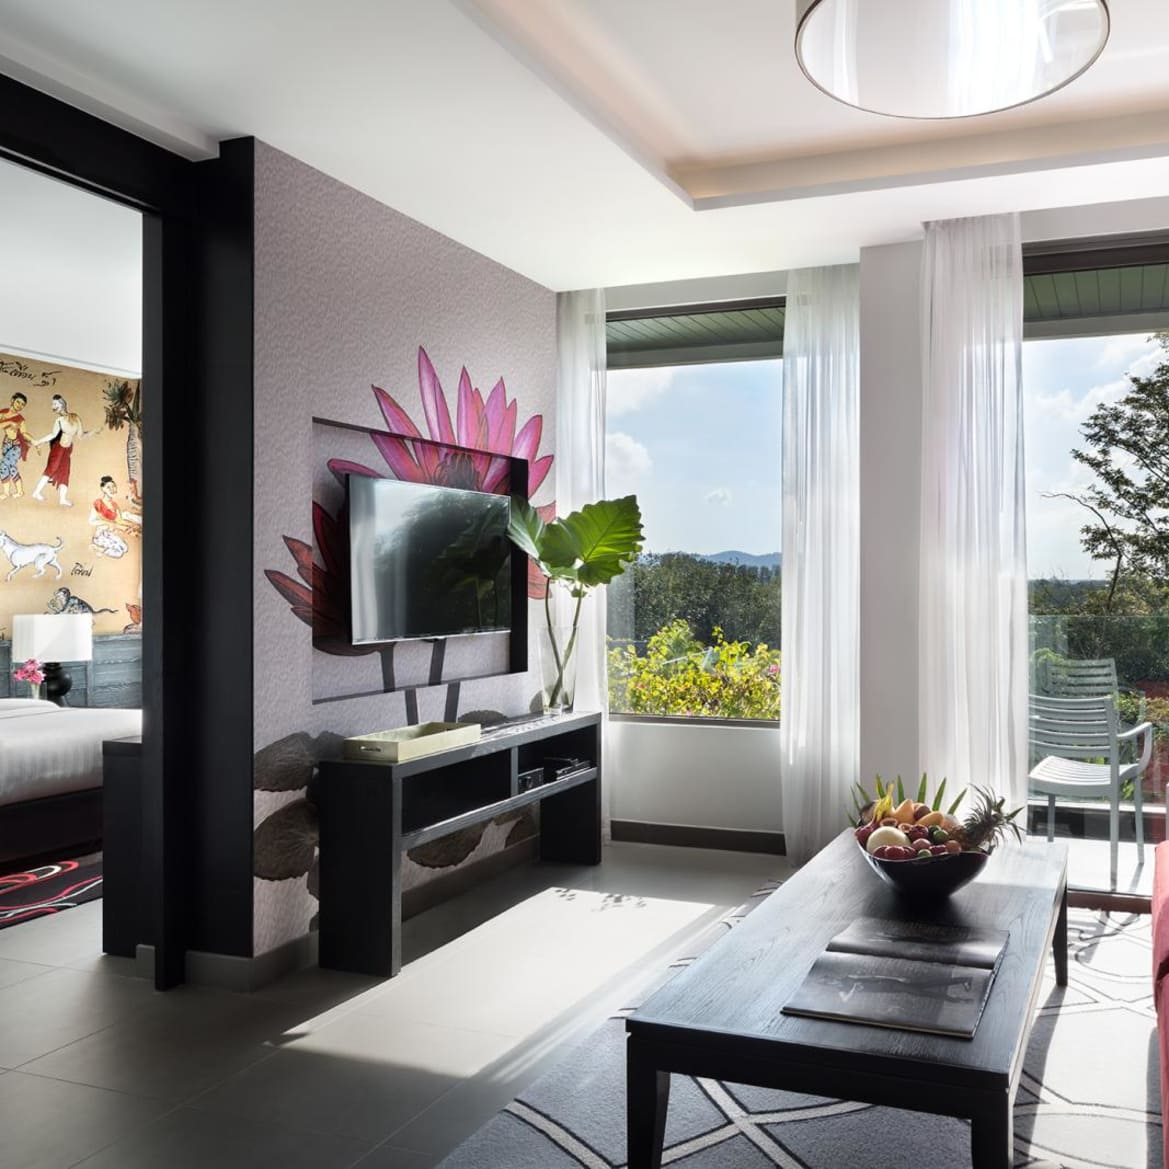 Hill View Suite - The Pavilions Phuket